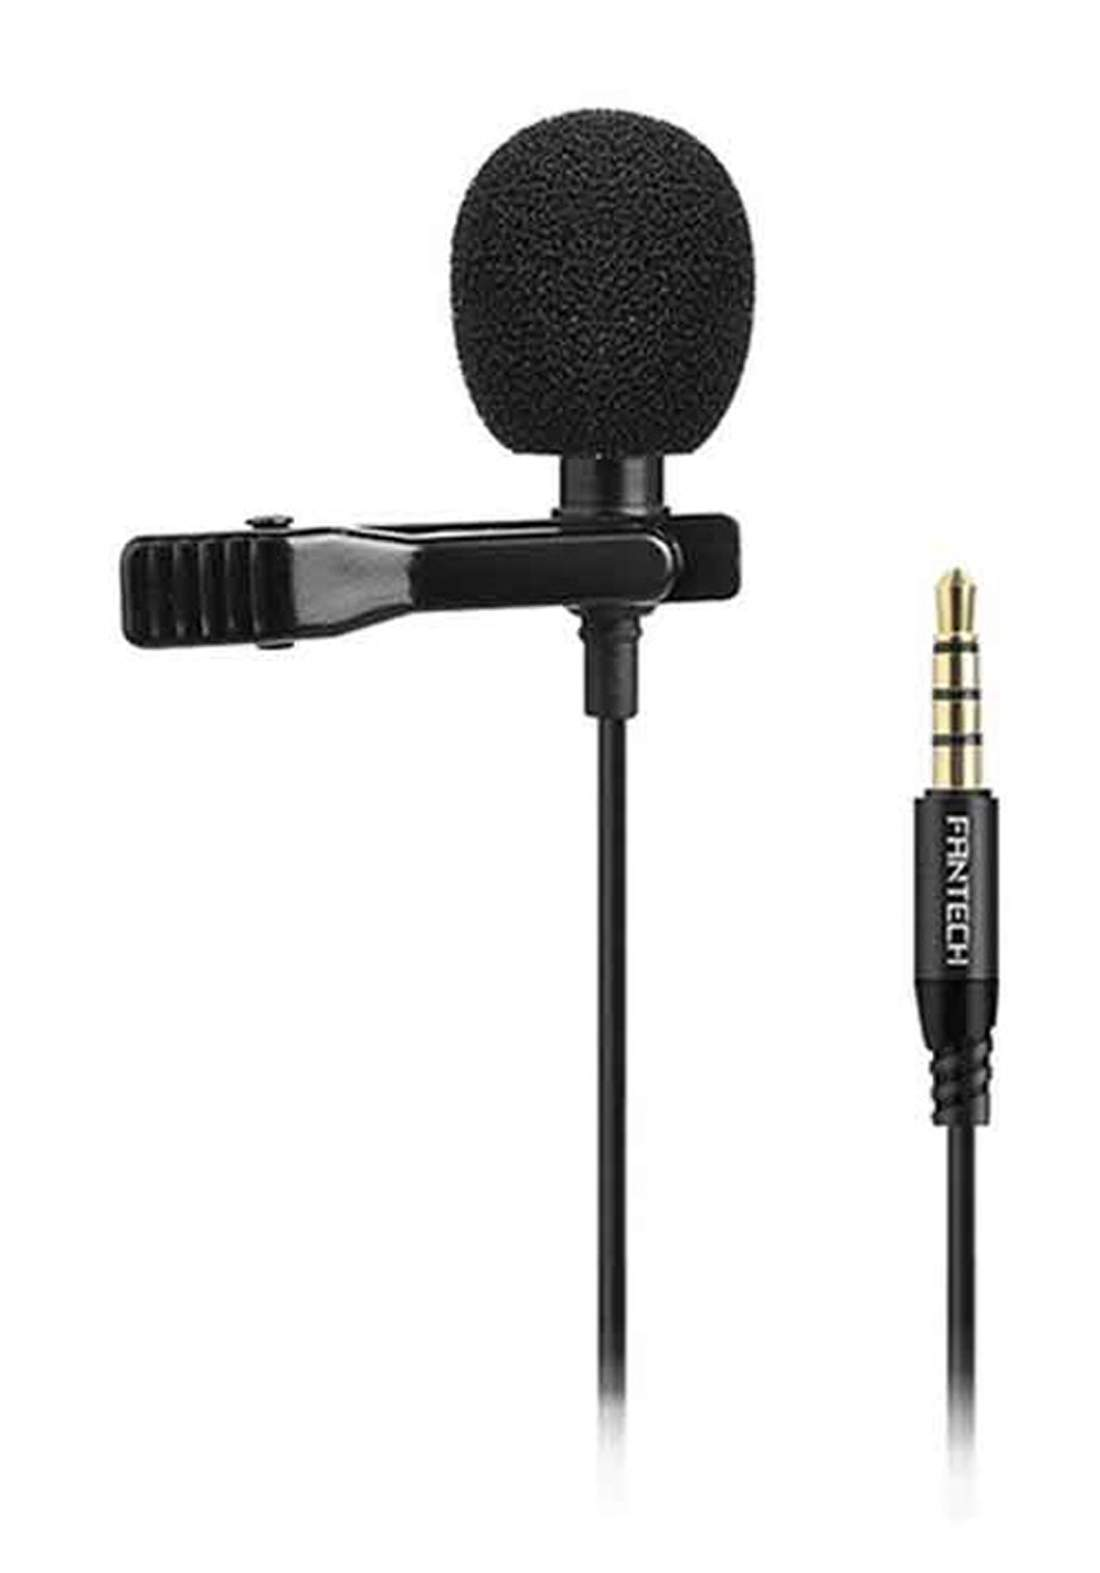 Fantech MV-01 Lavalier Microphone - Black مايكروفون